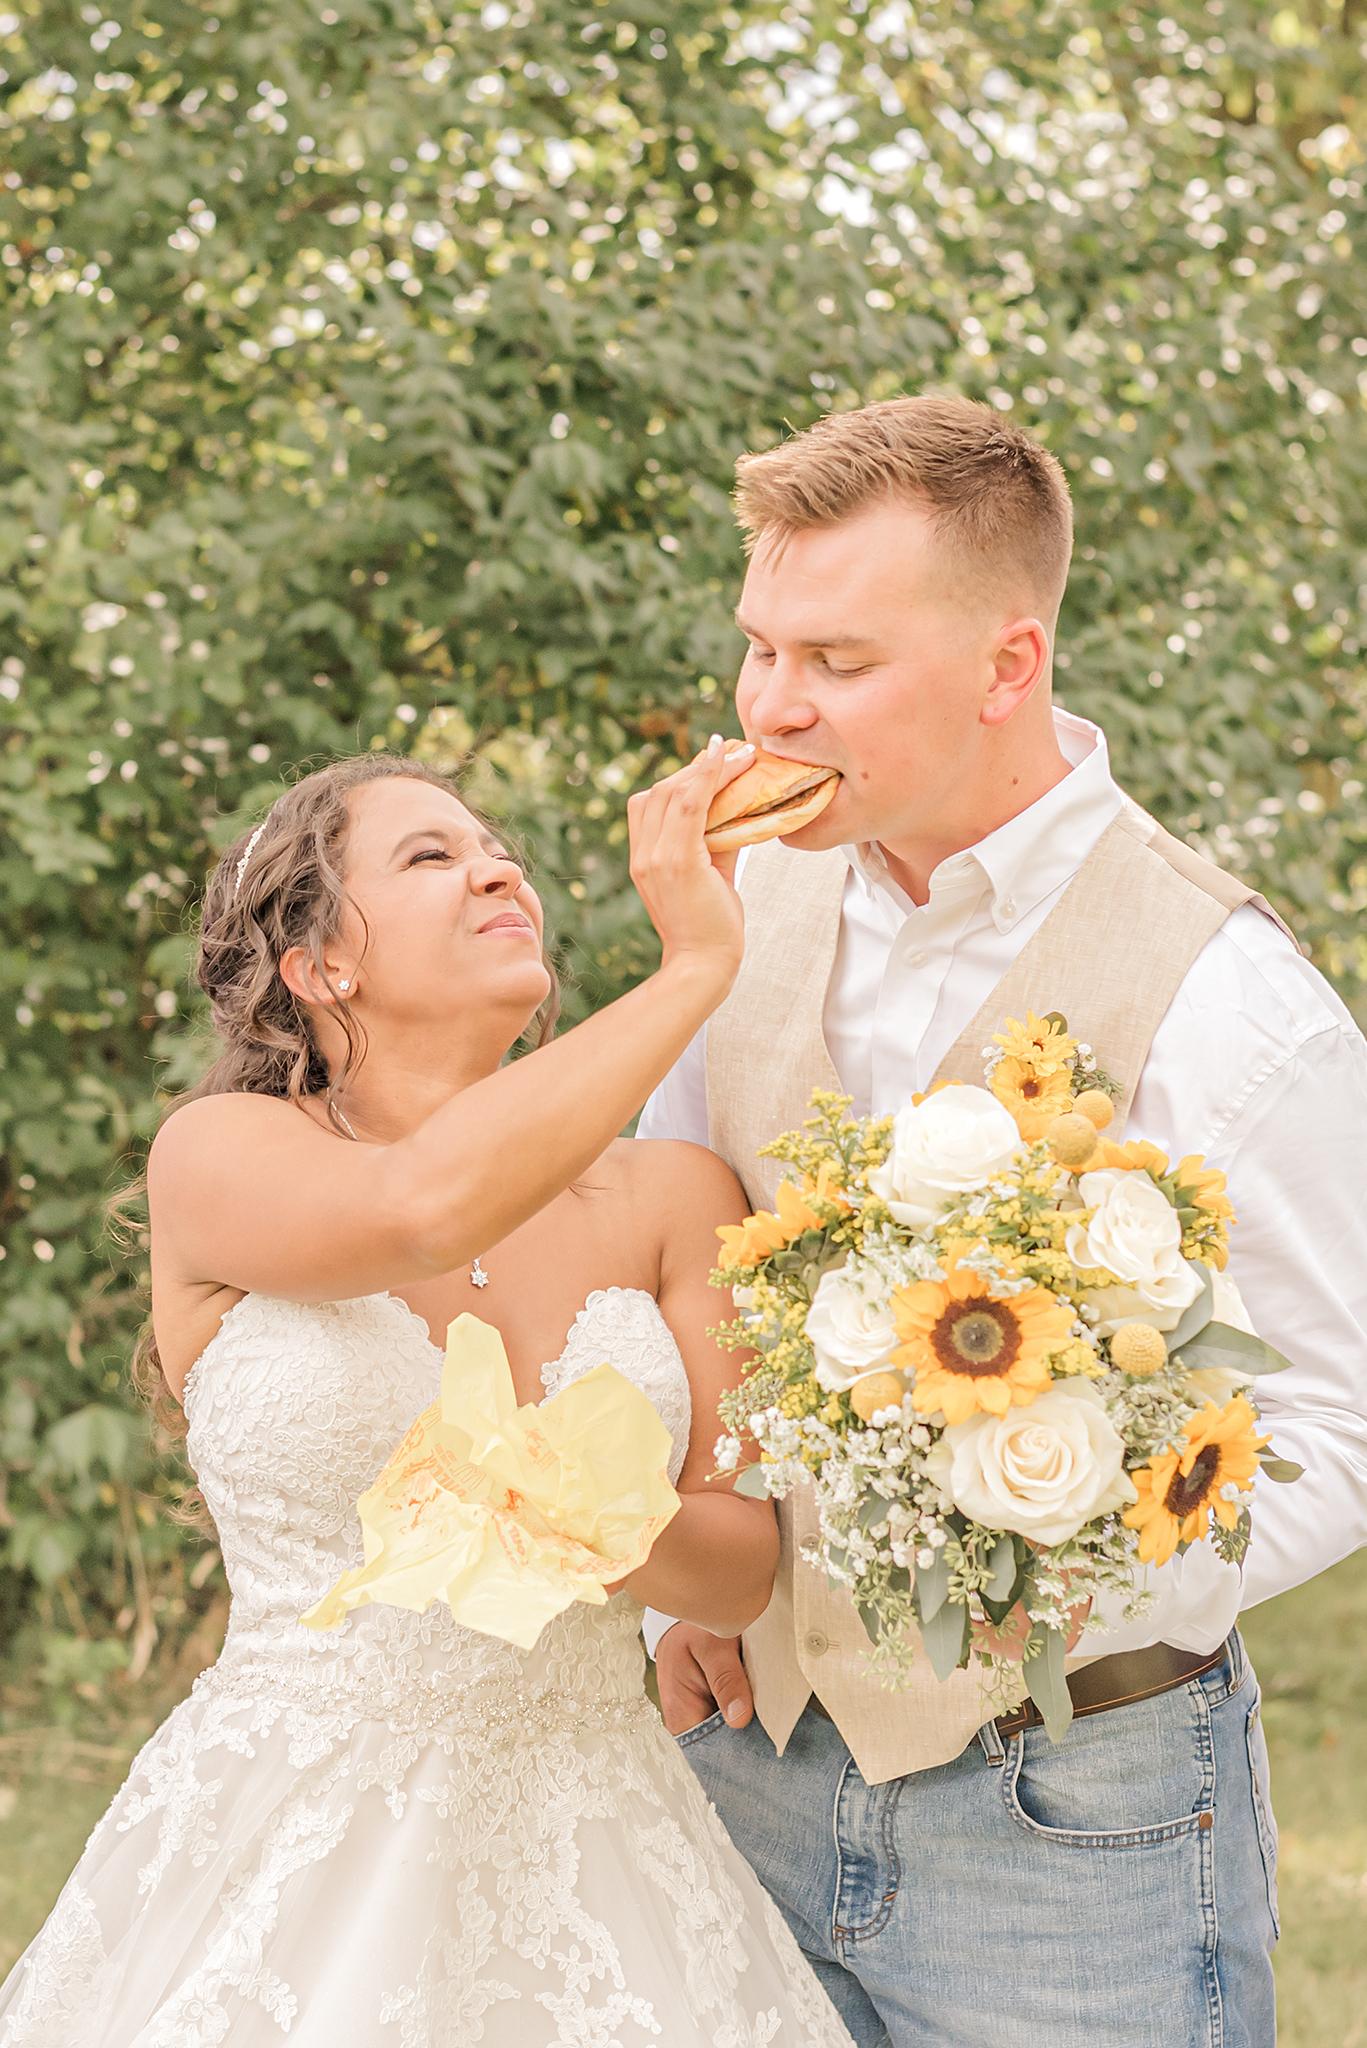 Lindsay-Adkins-Photography-Michigan-Wedding-Photographer-Wind-Hill-Farm